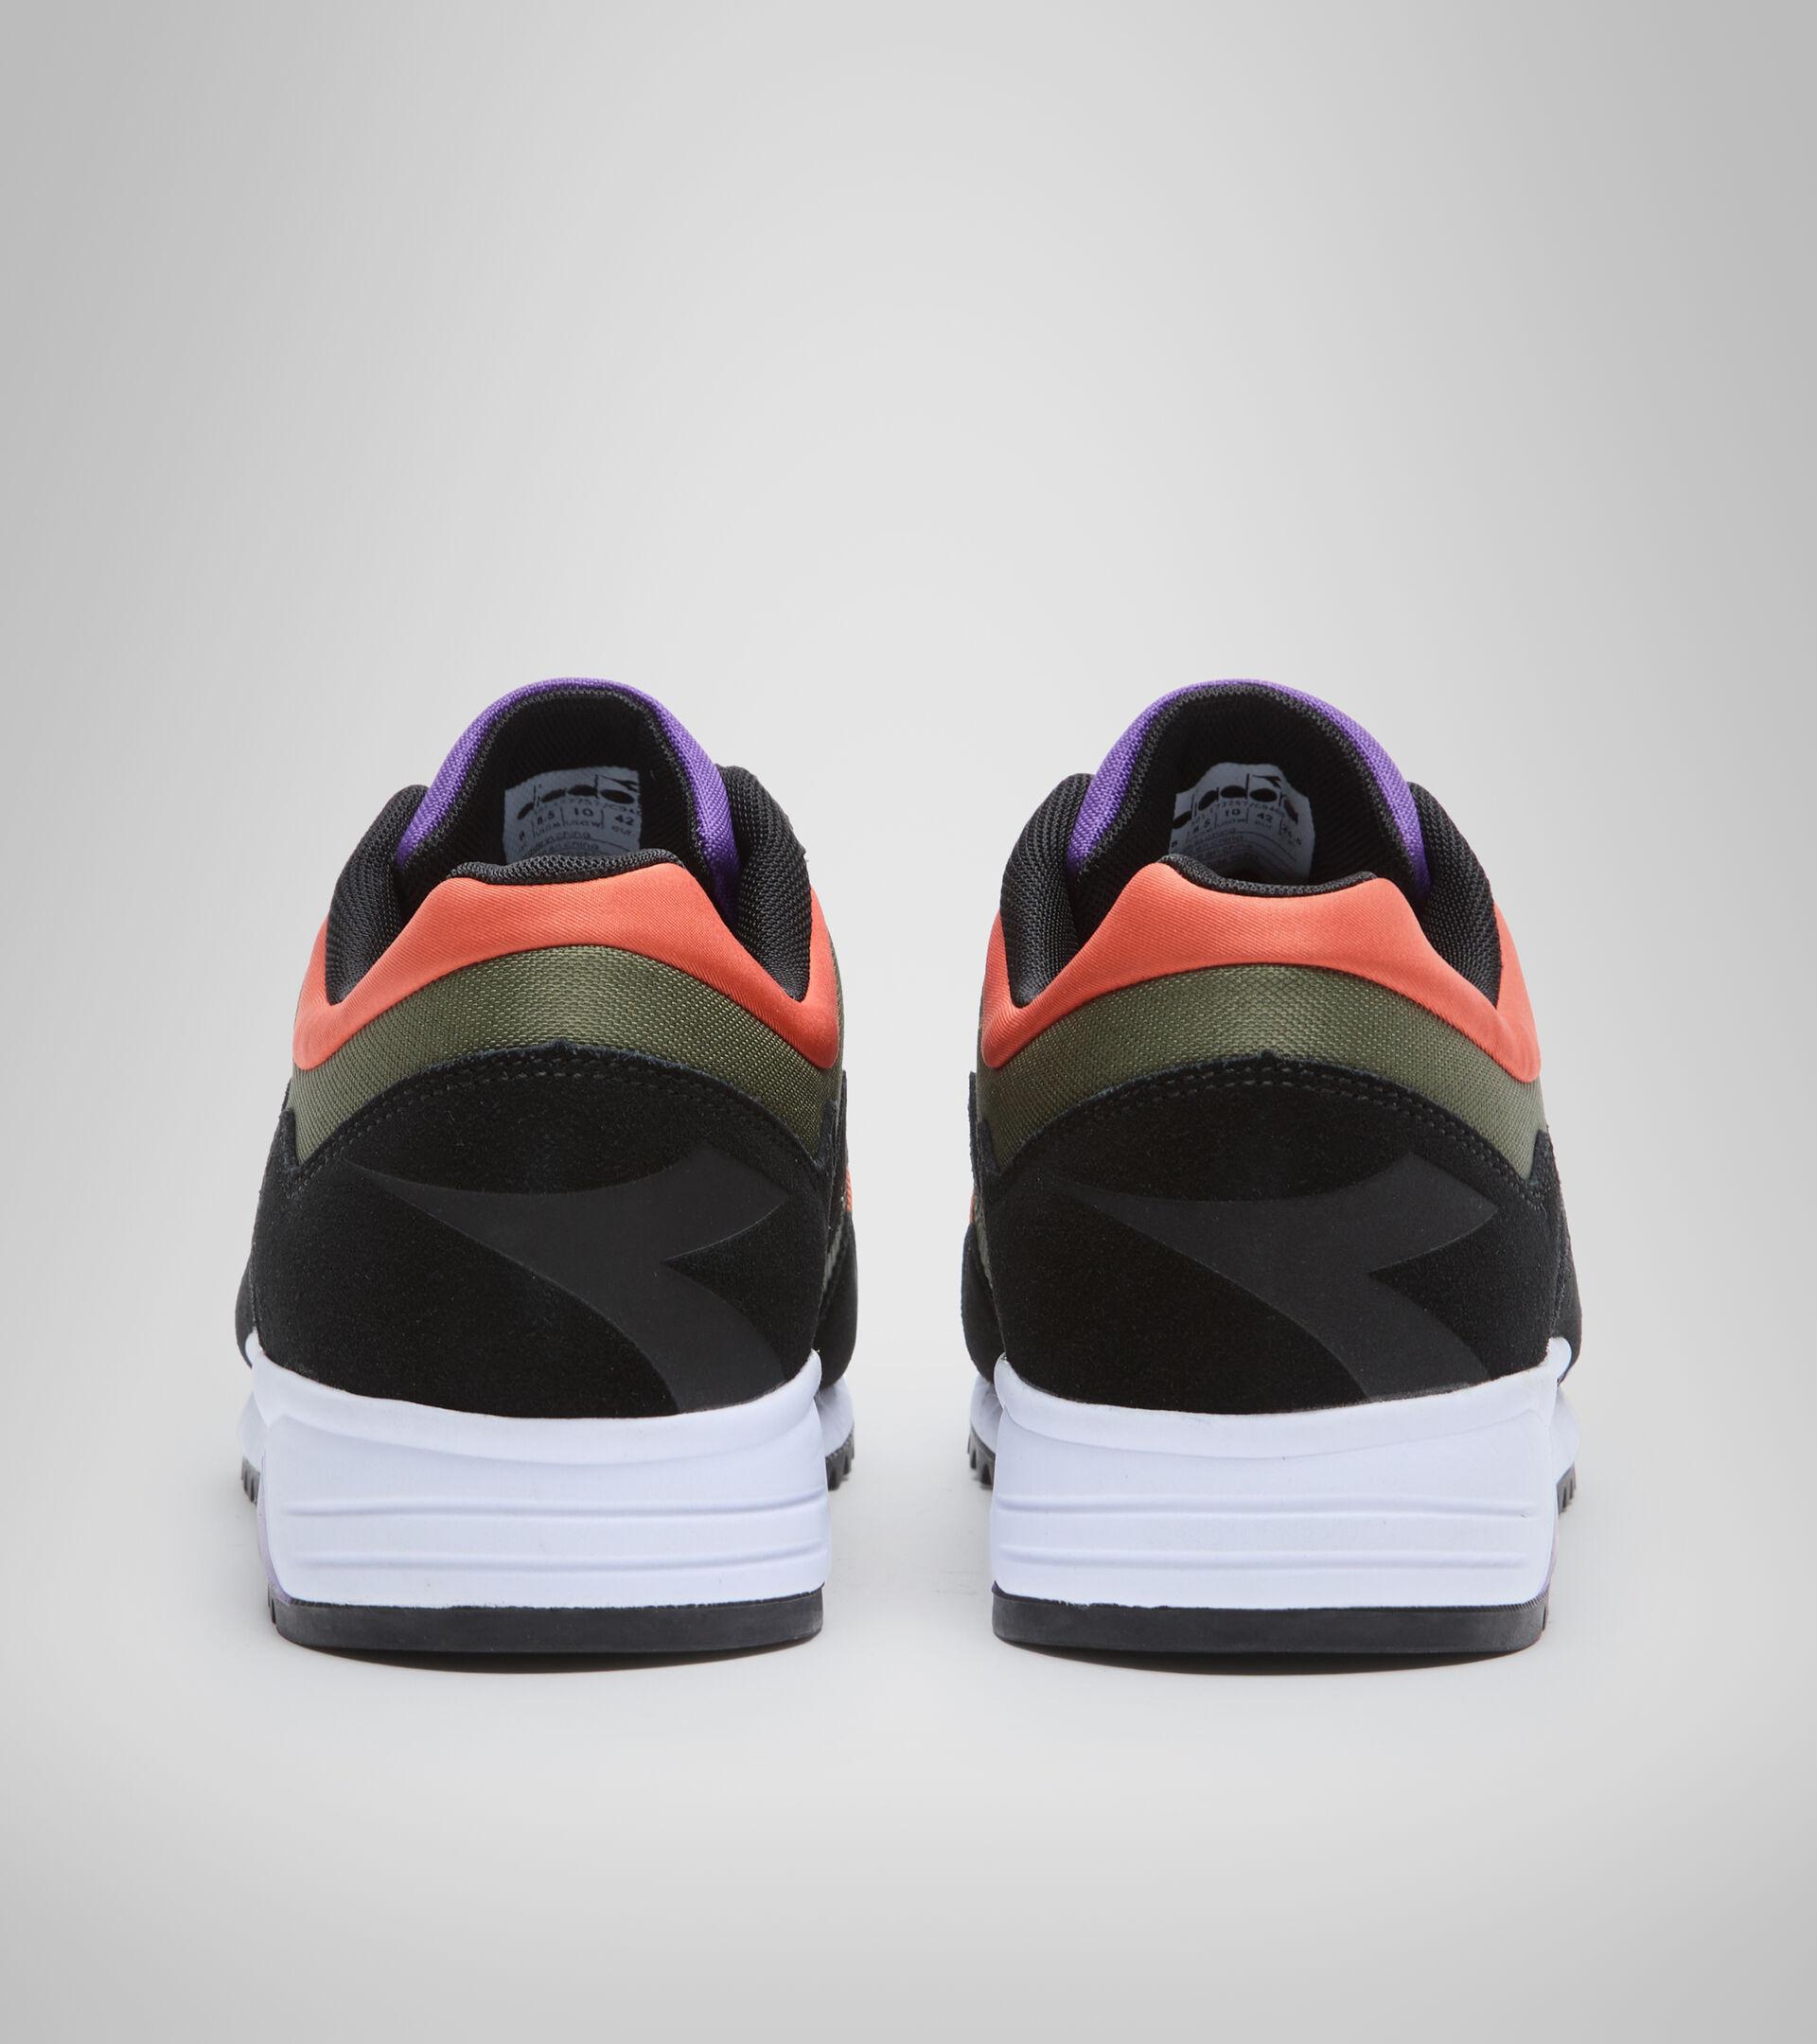 Sports shoe - Unisex N902 OFF ROAD CYPRESS/BLACK/PASSION FLOWER - Diadora